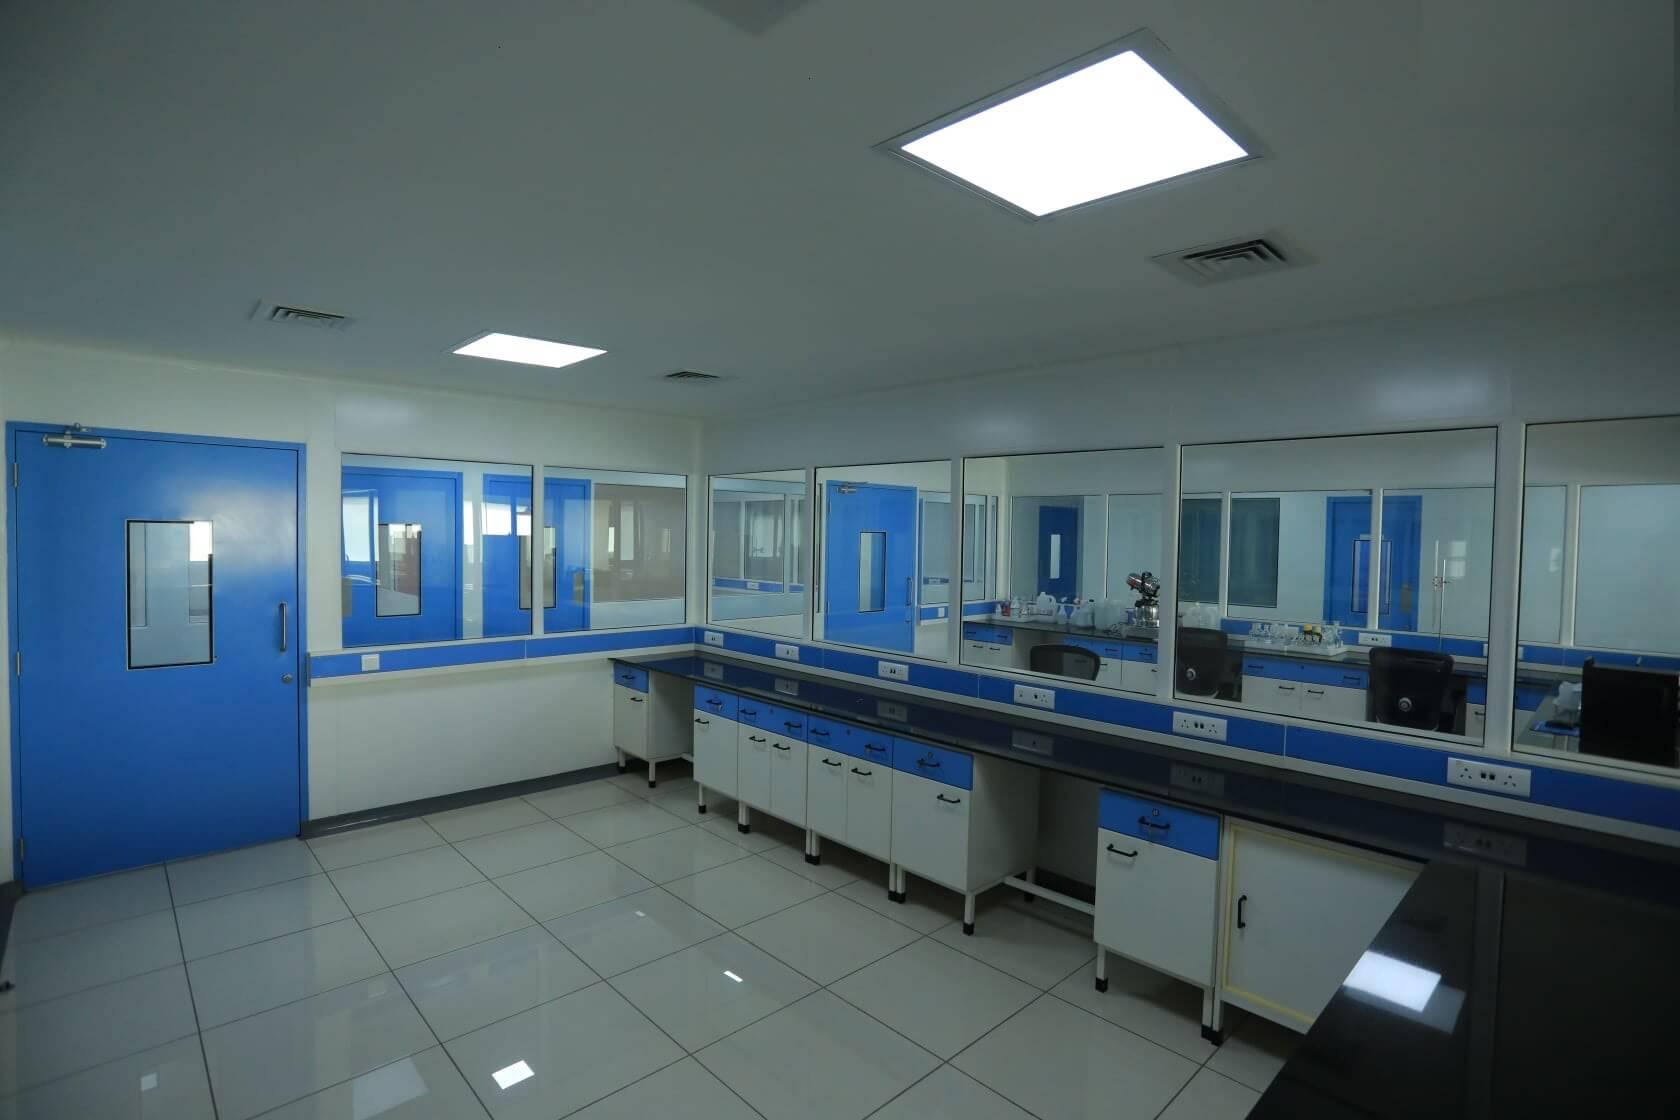 cleanroom walls panels